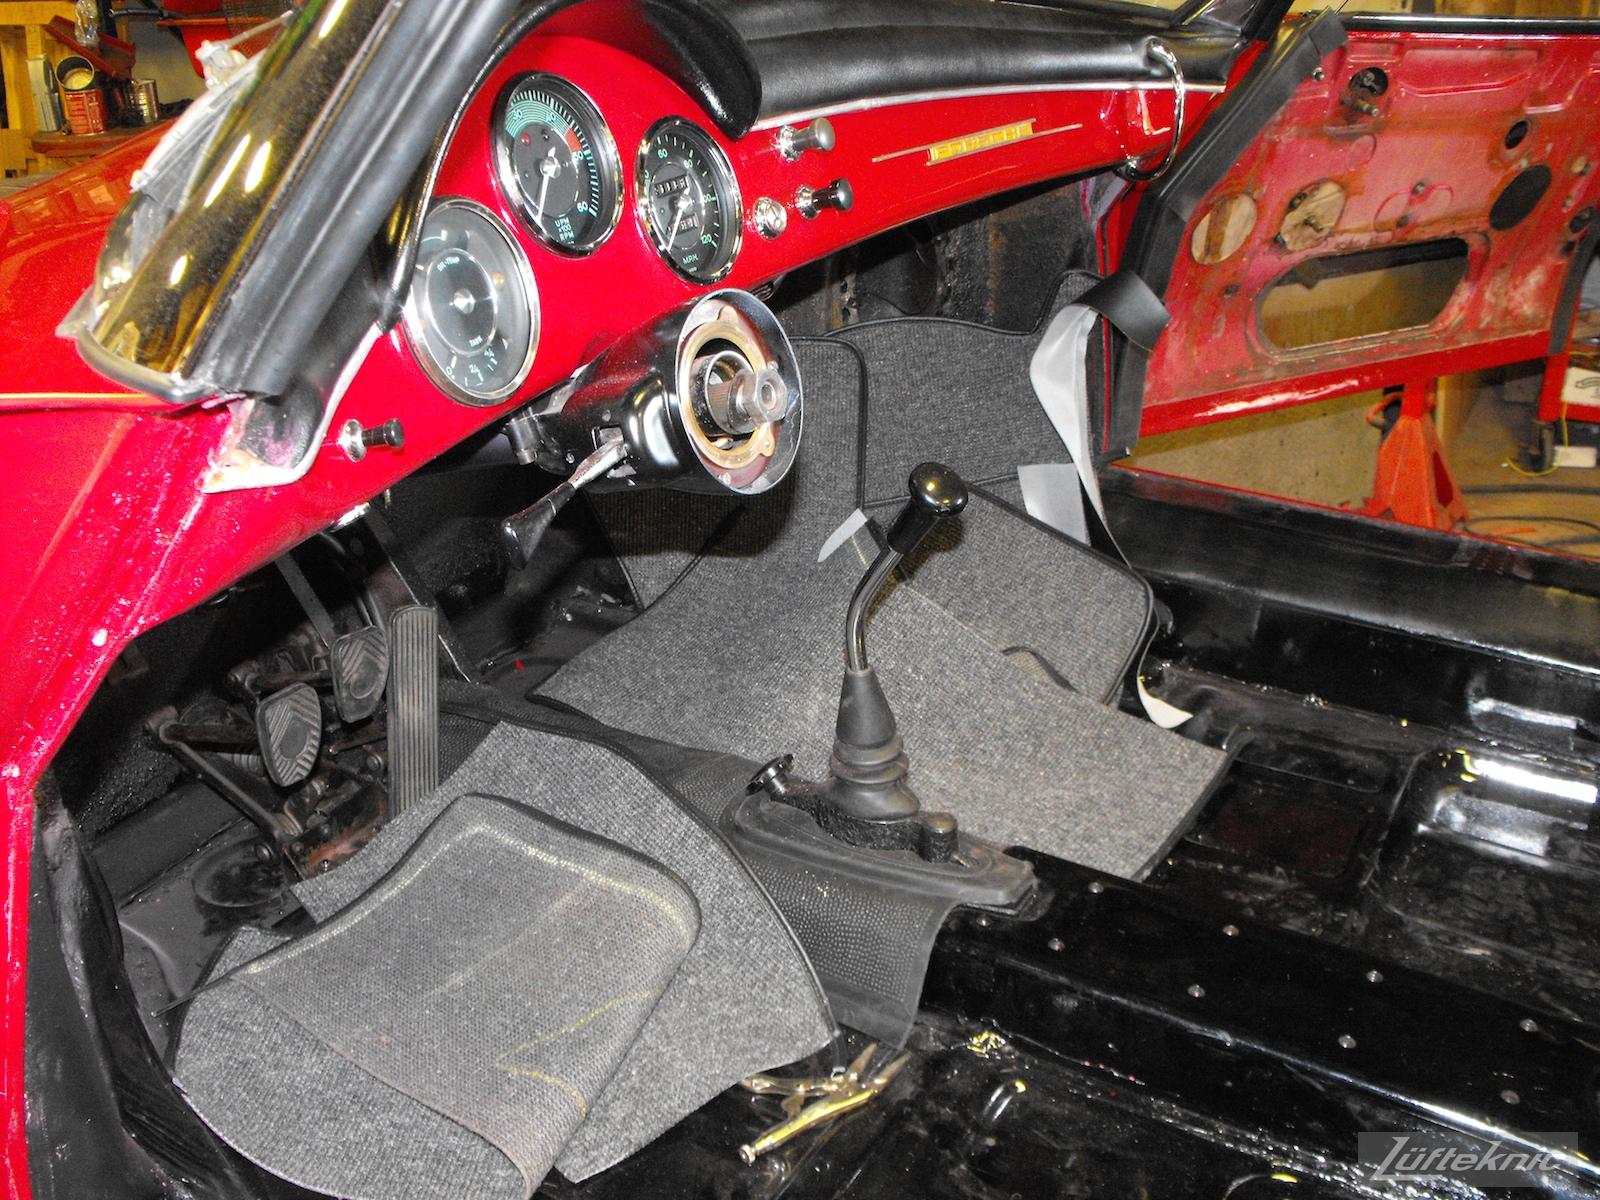 Interior reassembly on a 1961 Porsche 356B Roadster restoration.